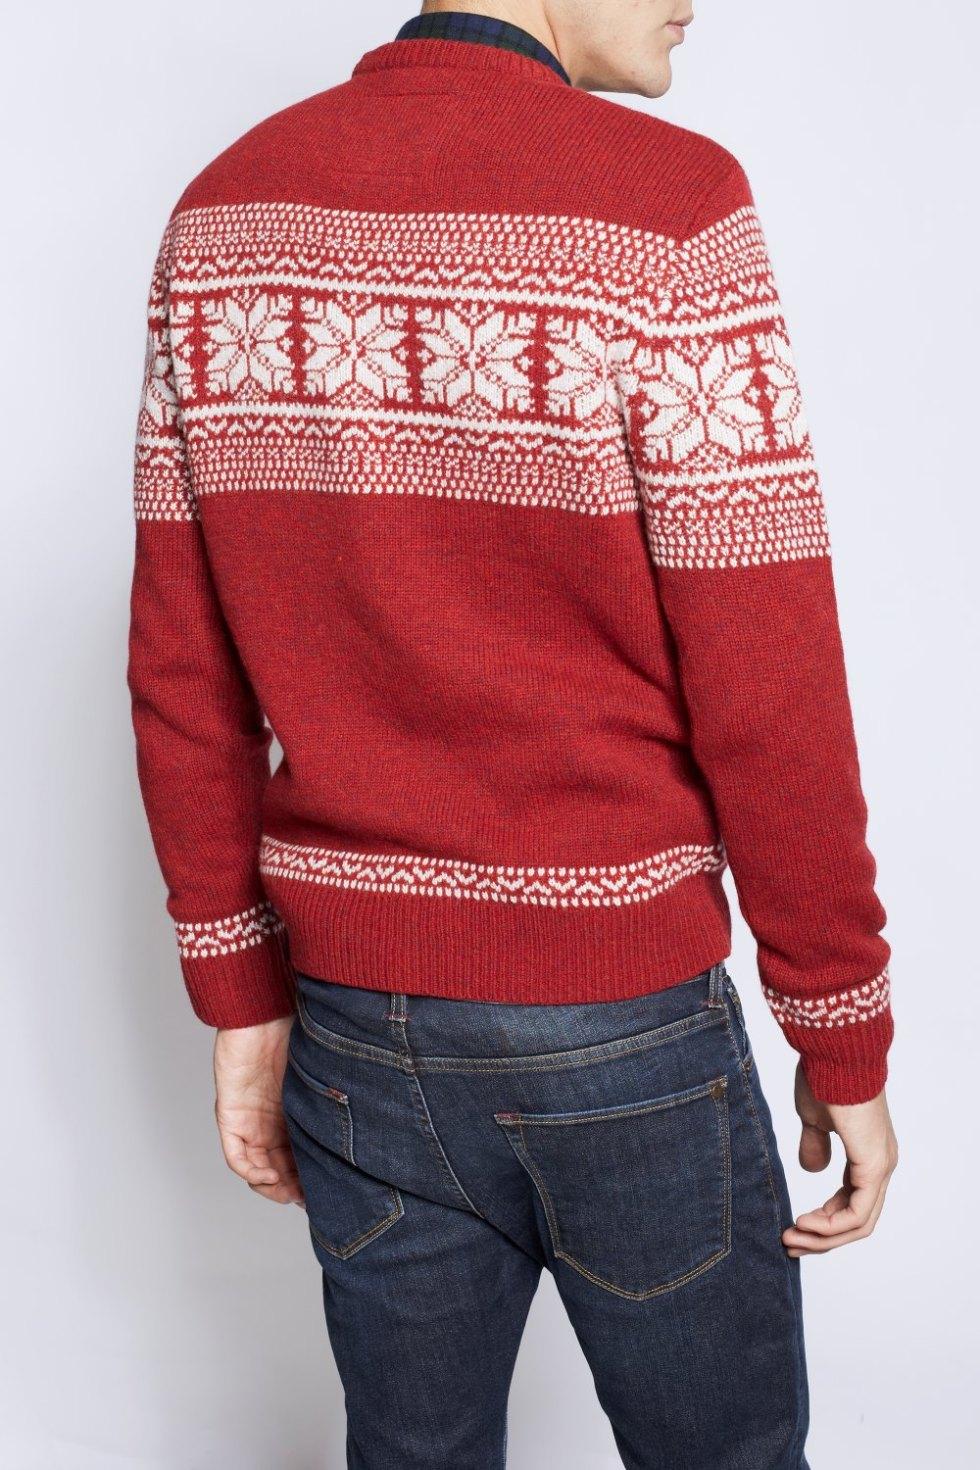 Jack Wills, maglione norvegese, Ashkirk Fairisle Crew